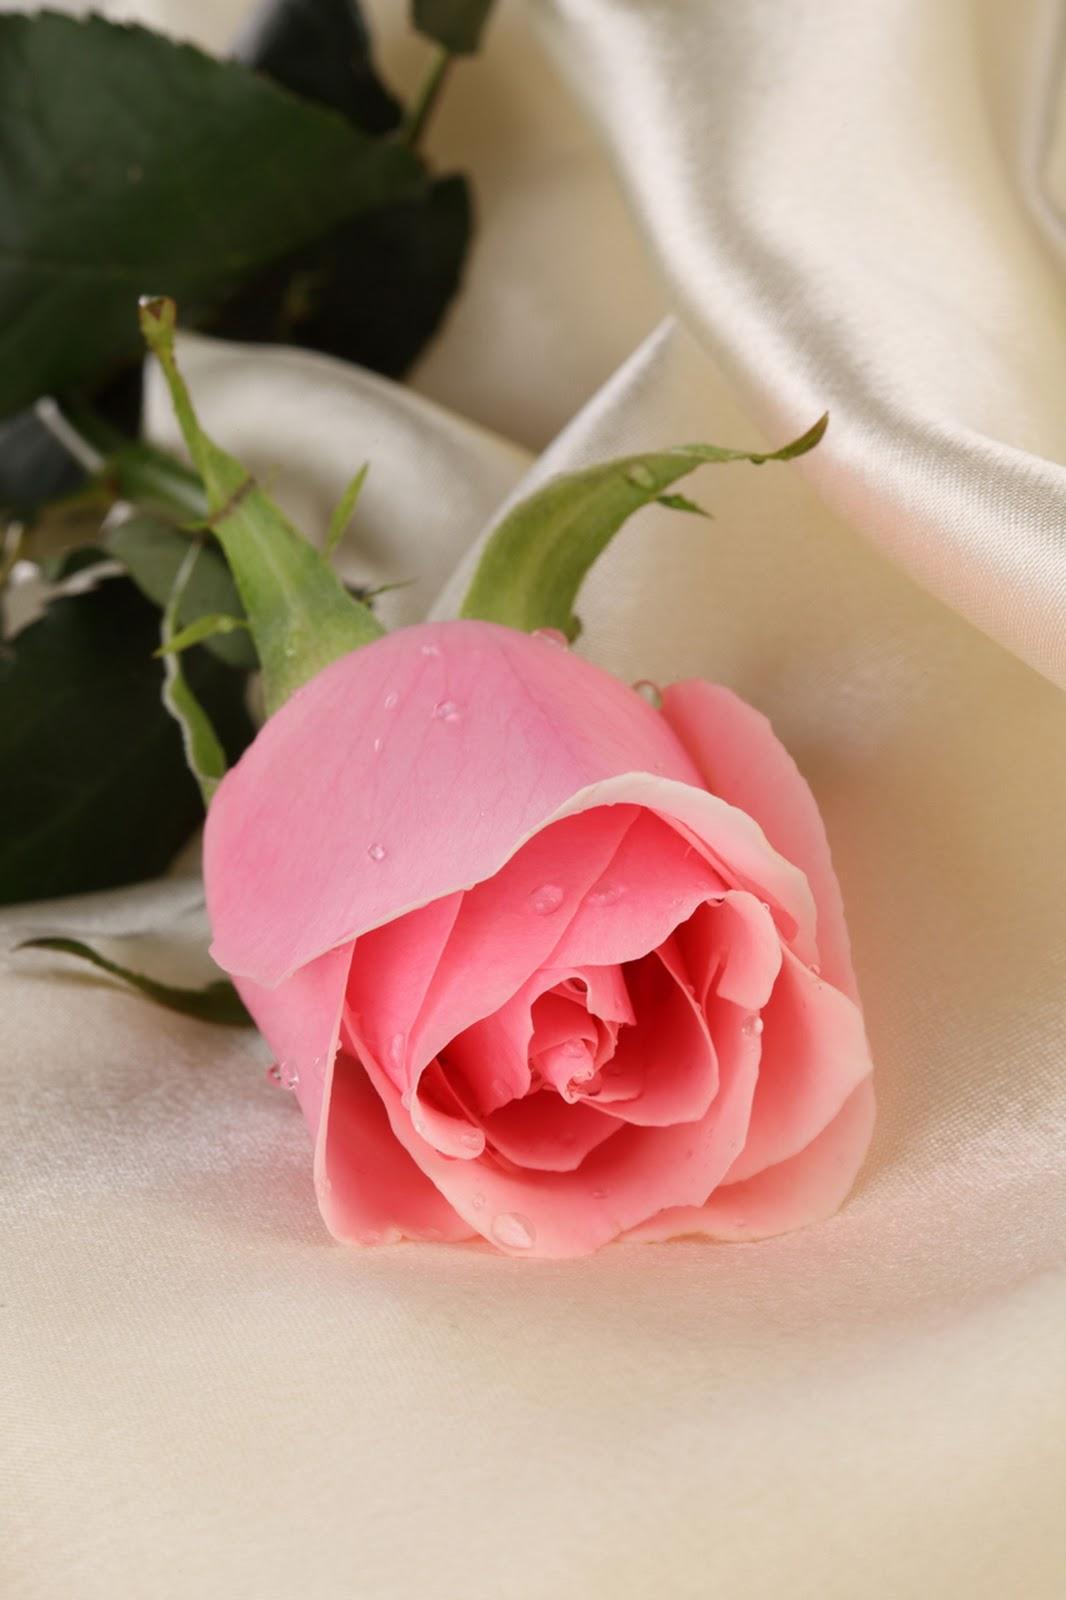 Gambar Bunga Mawar yang CantikCantik  wallpaper